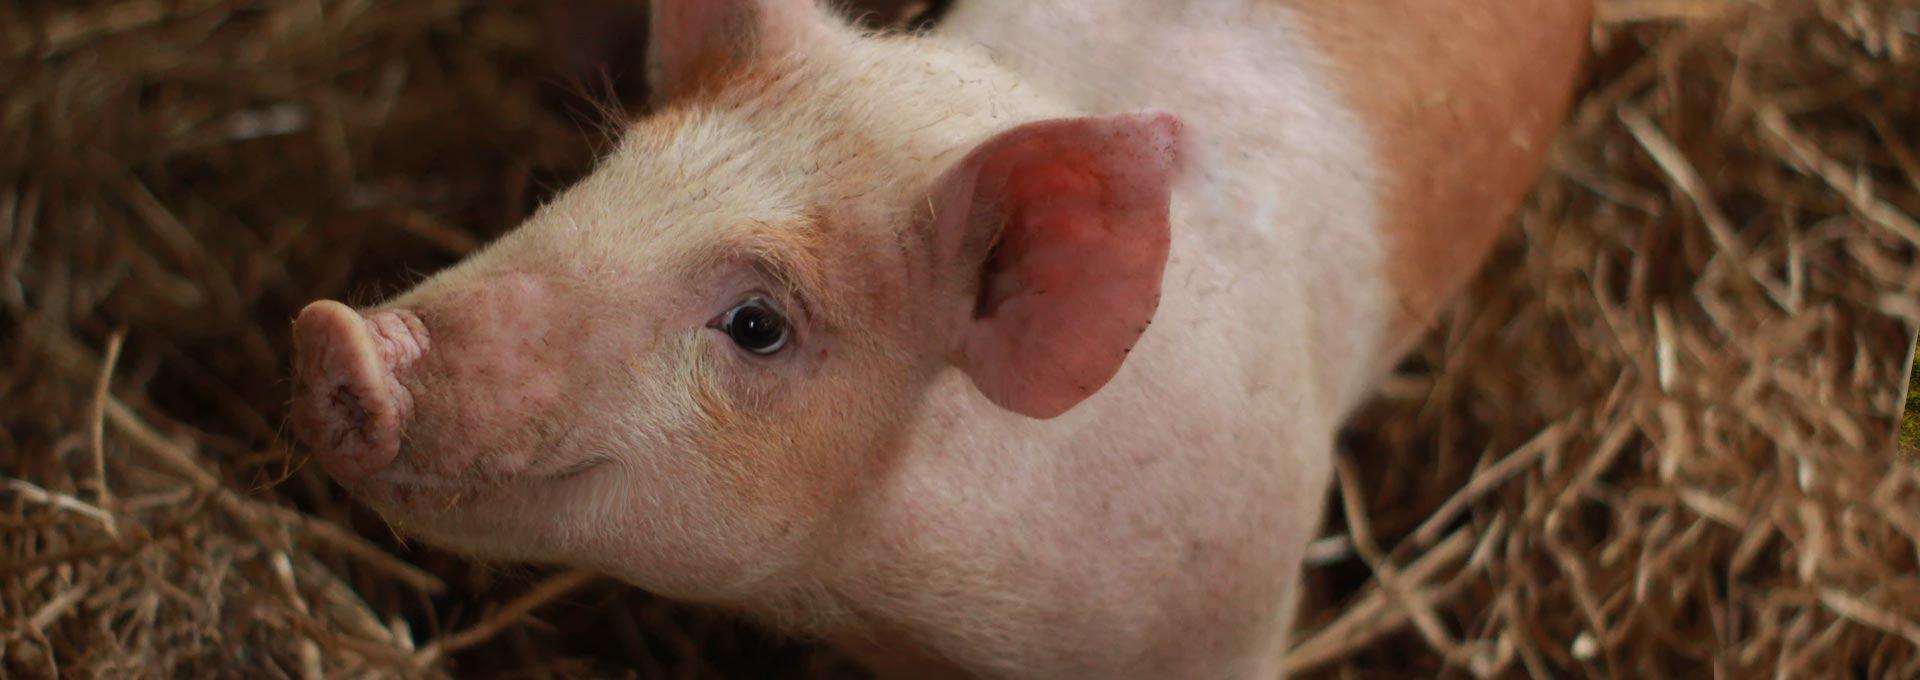 Veterinaria para cerdos